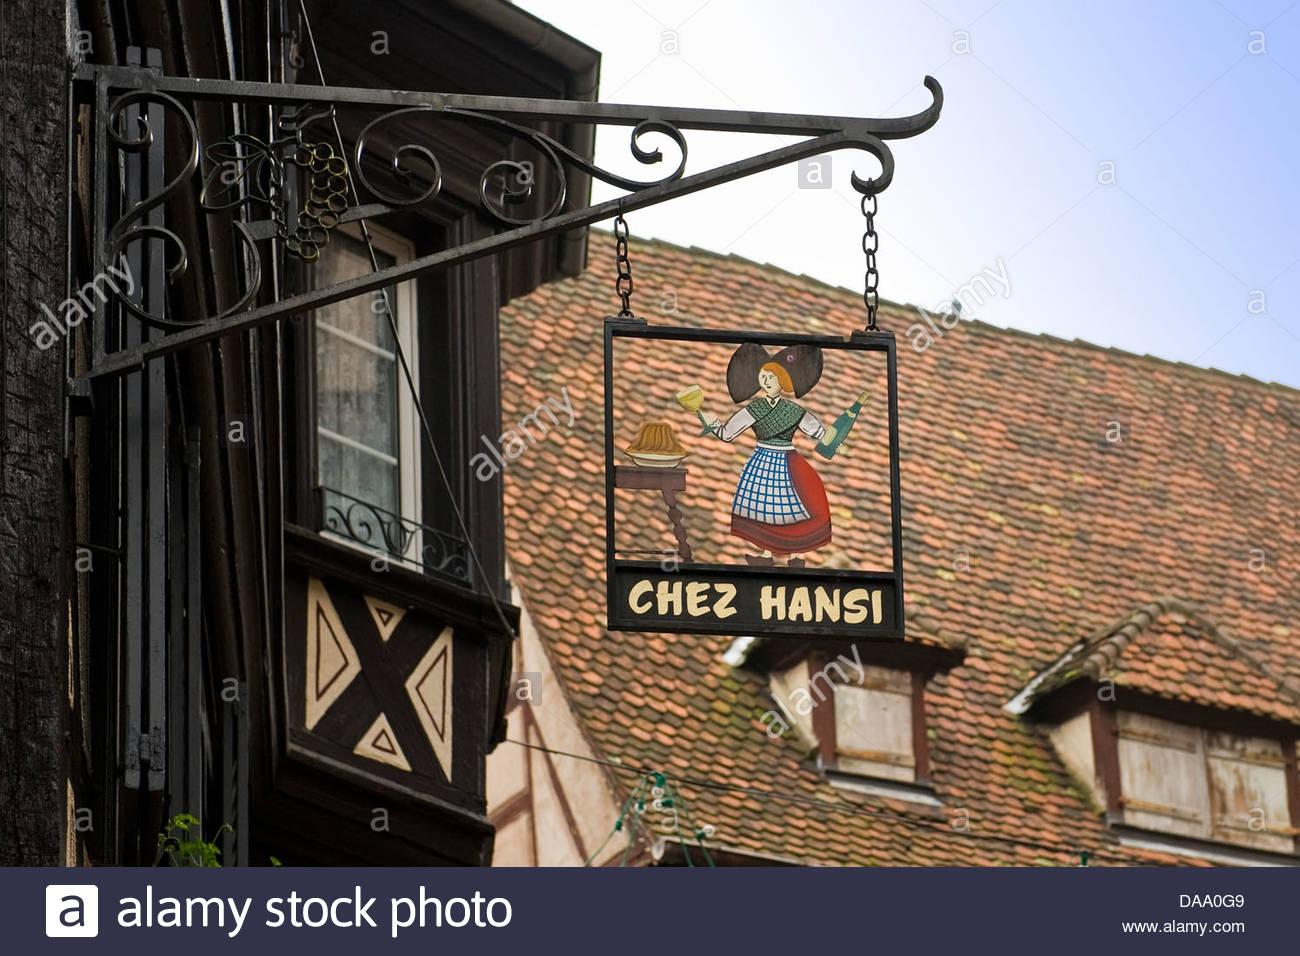 France,Alsace,Colmar,Chez Hansi - Stock Image